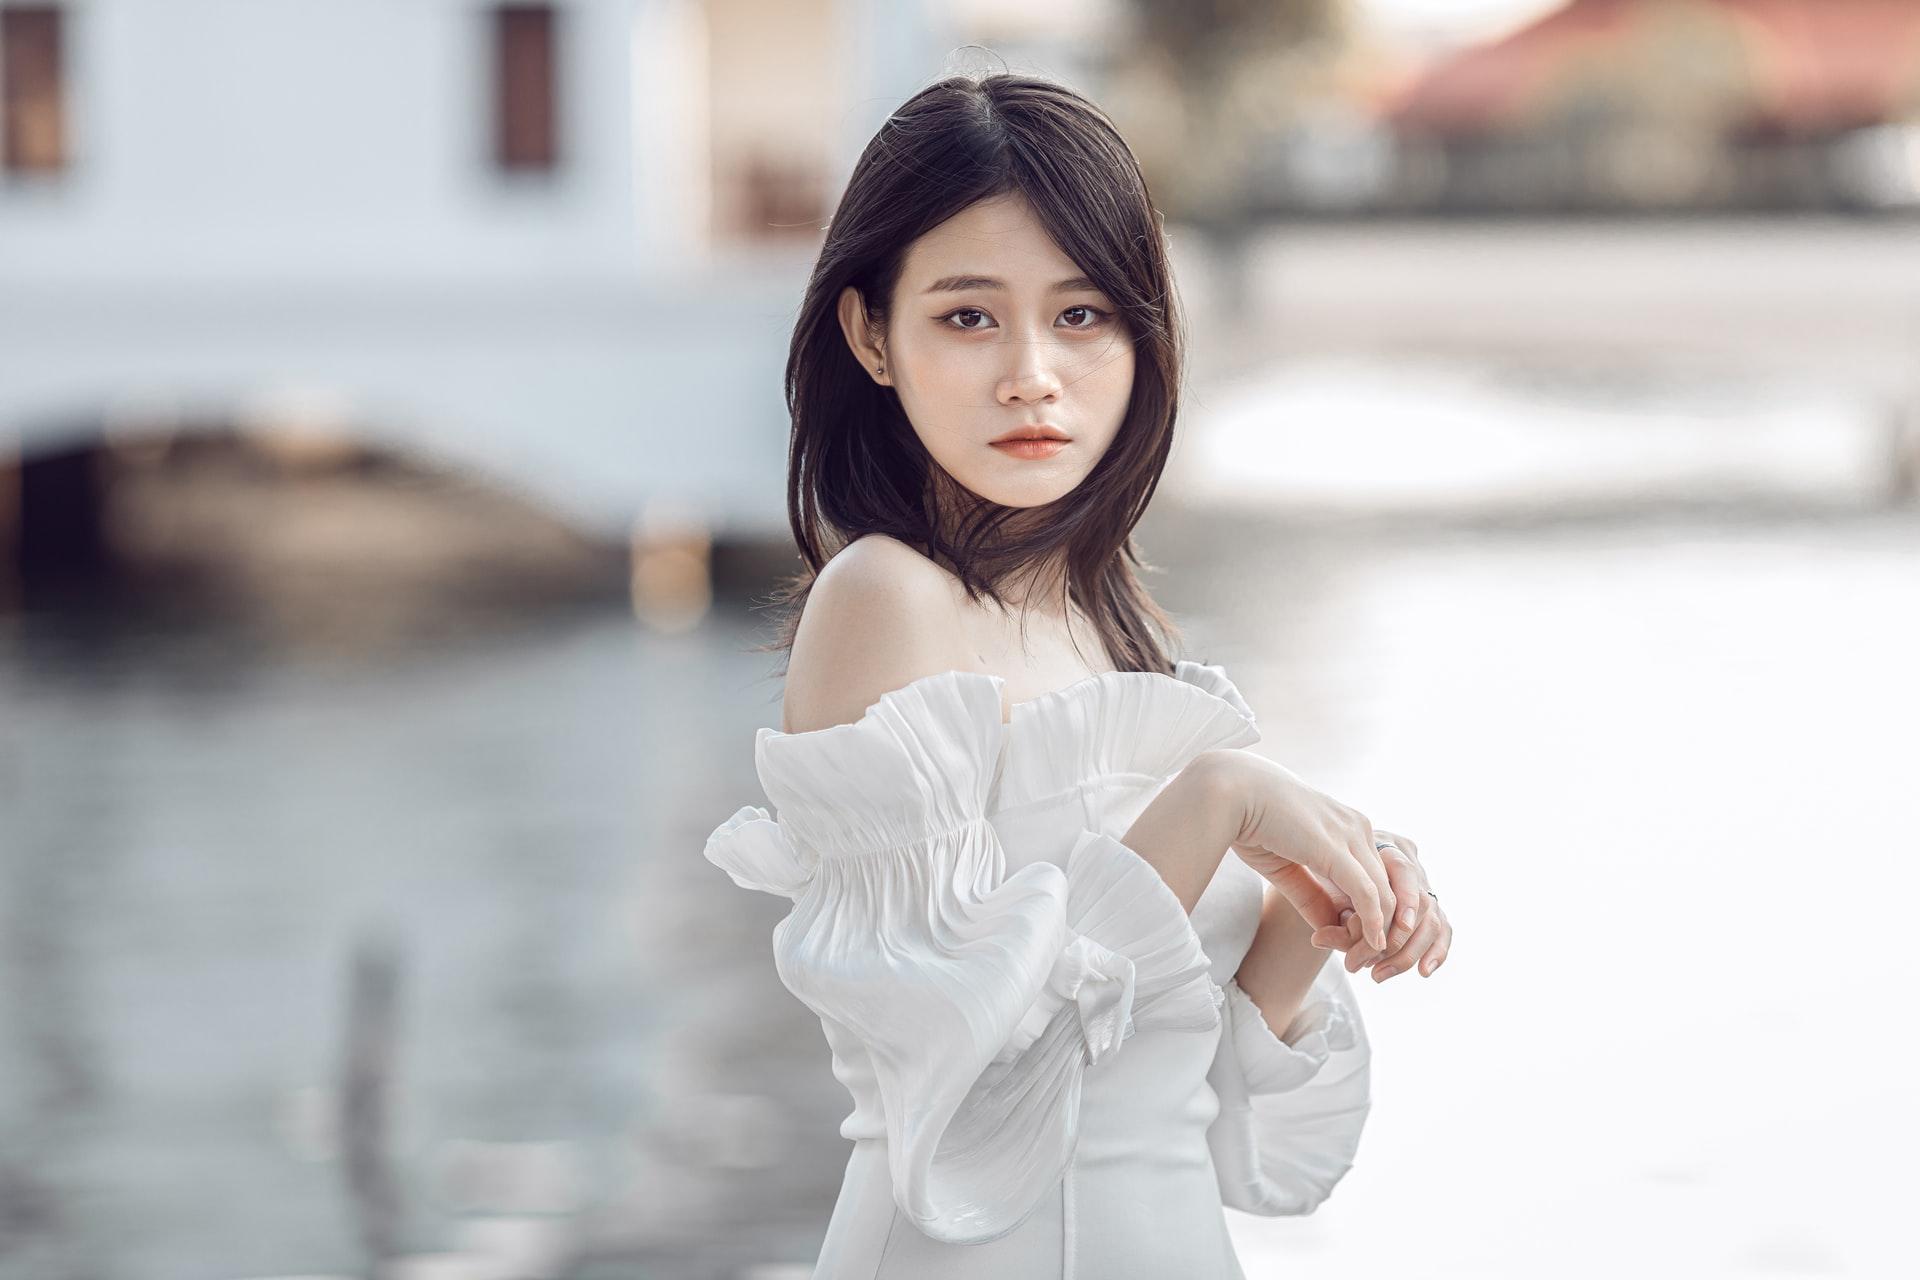 tender Japanese Woman